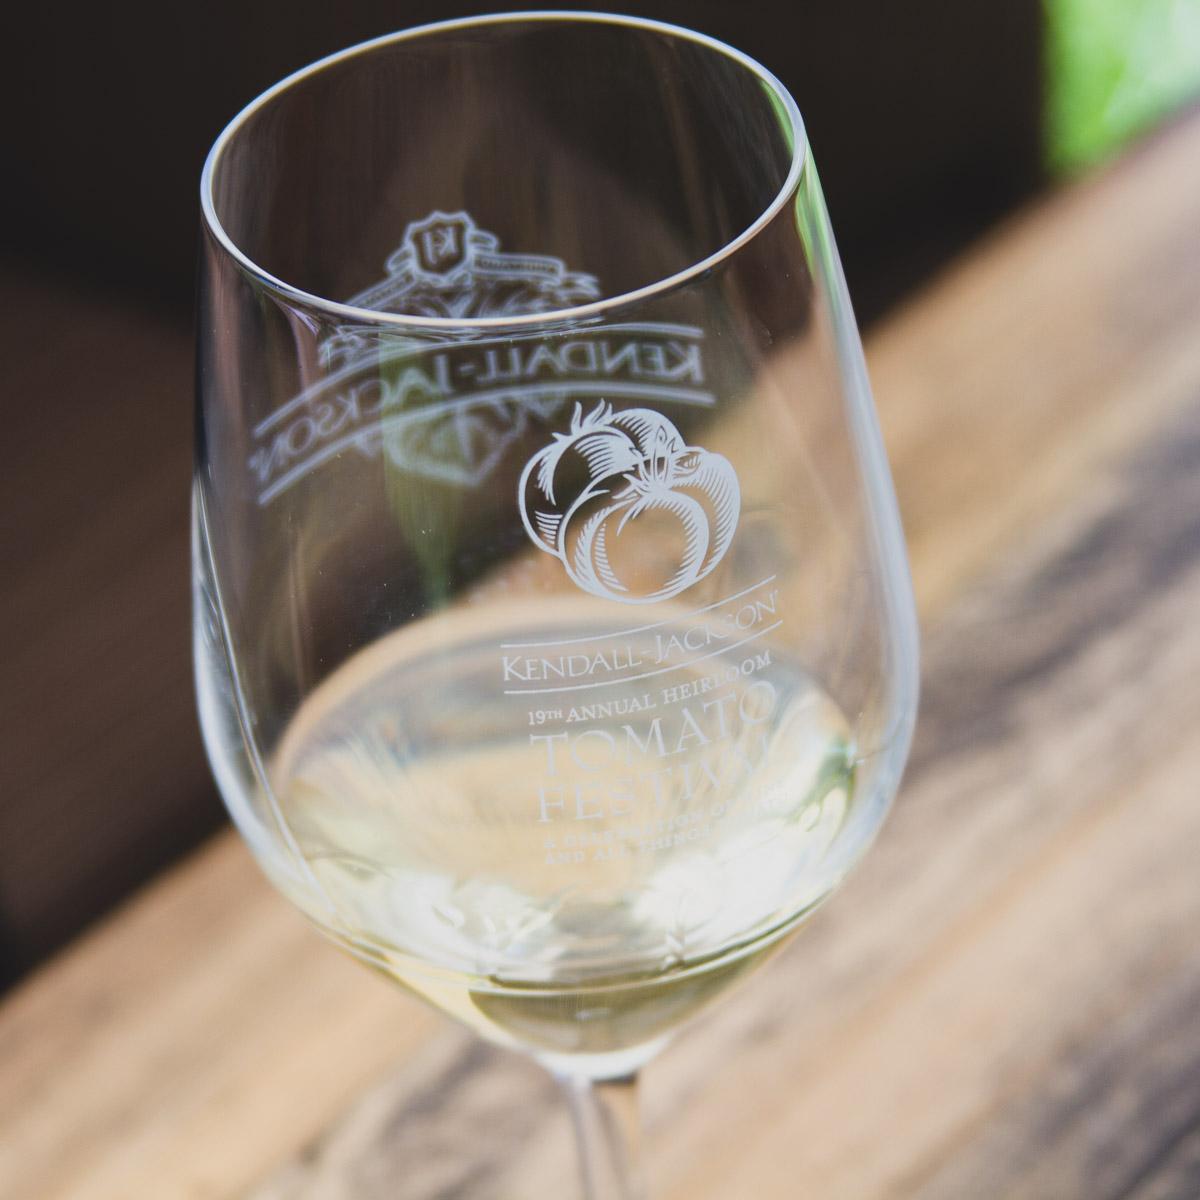 Crisp white wine